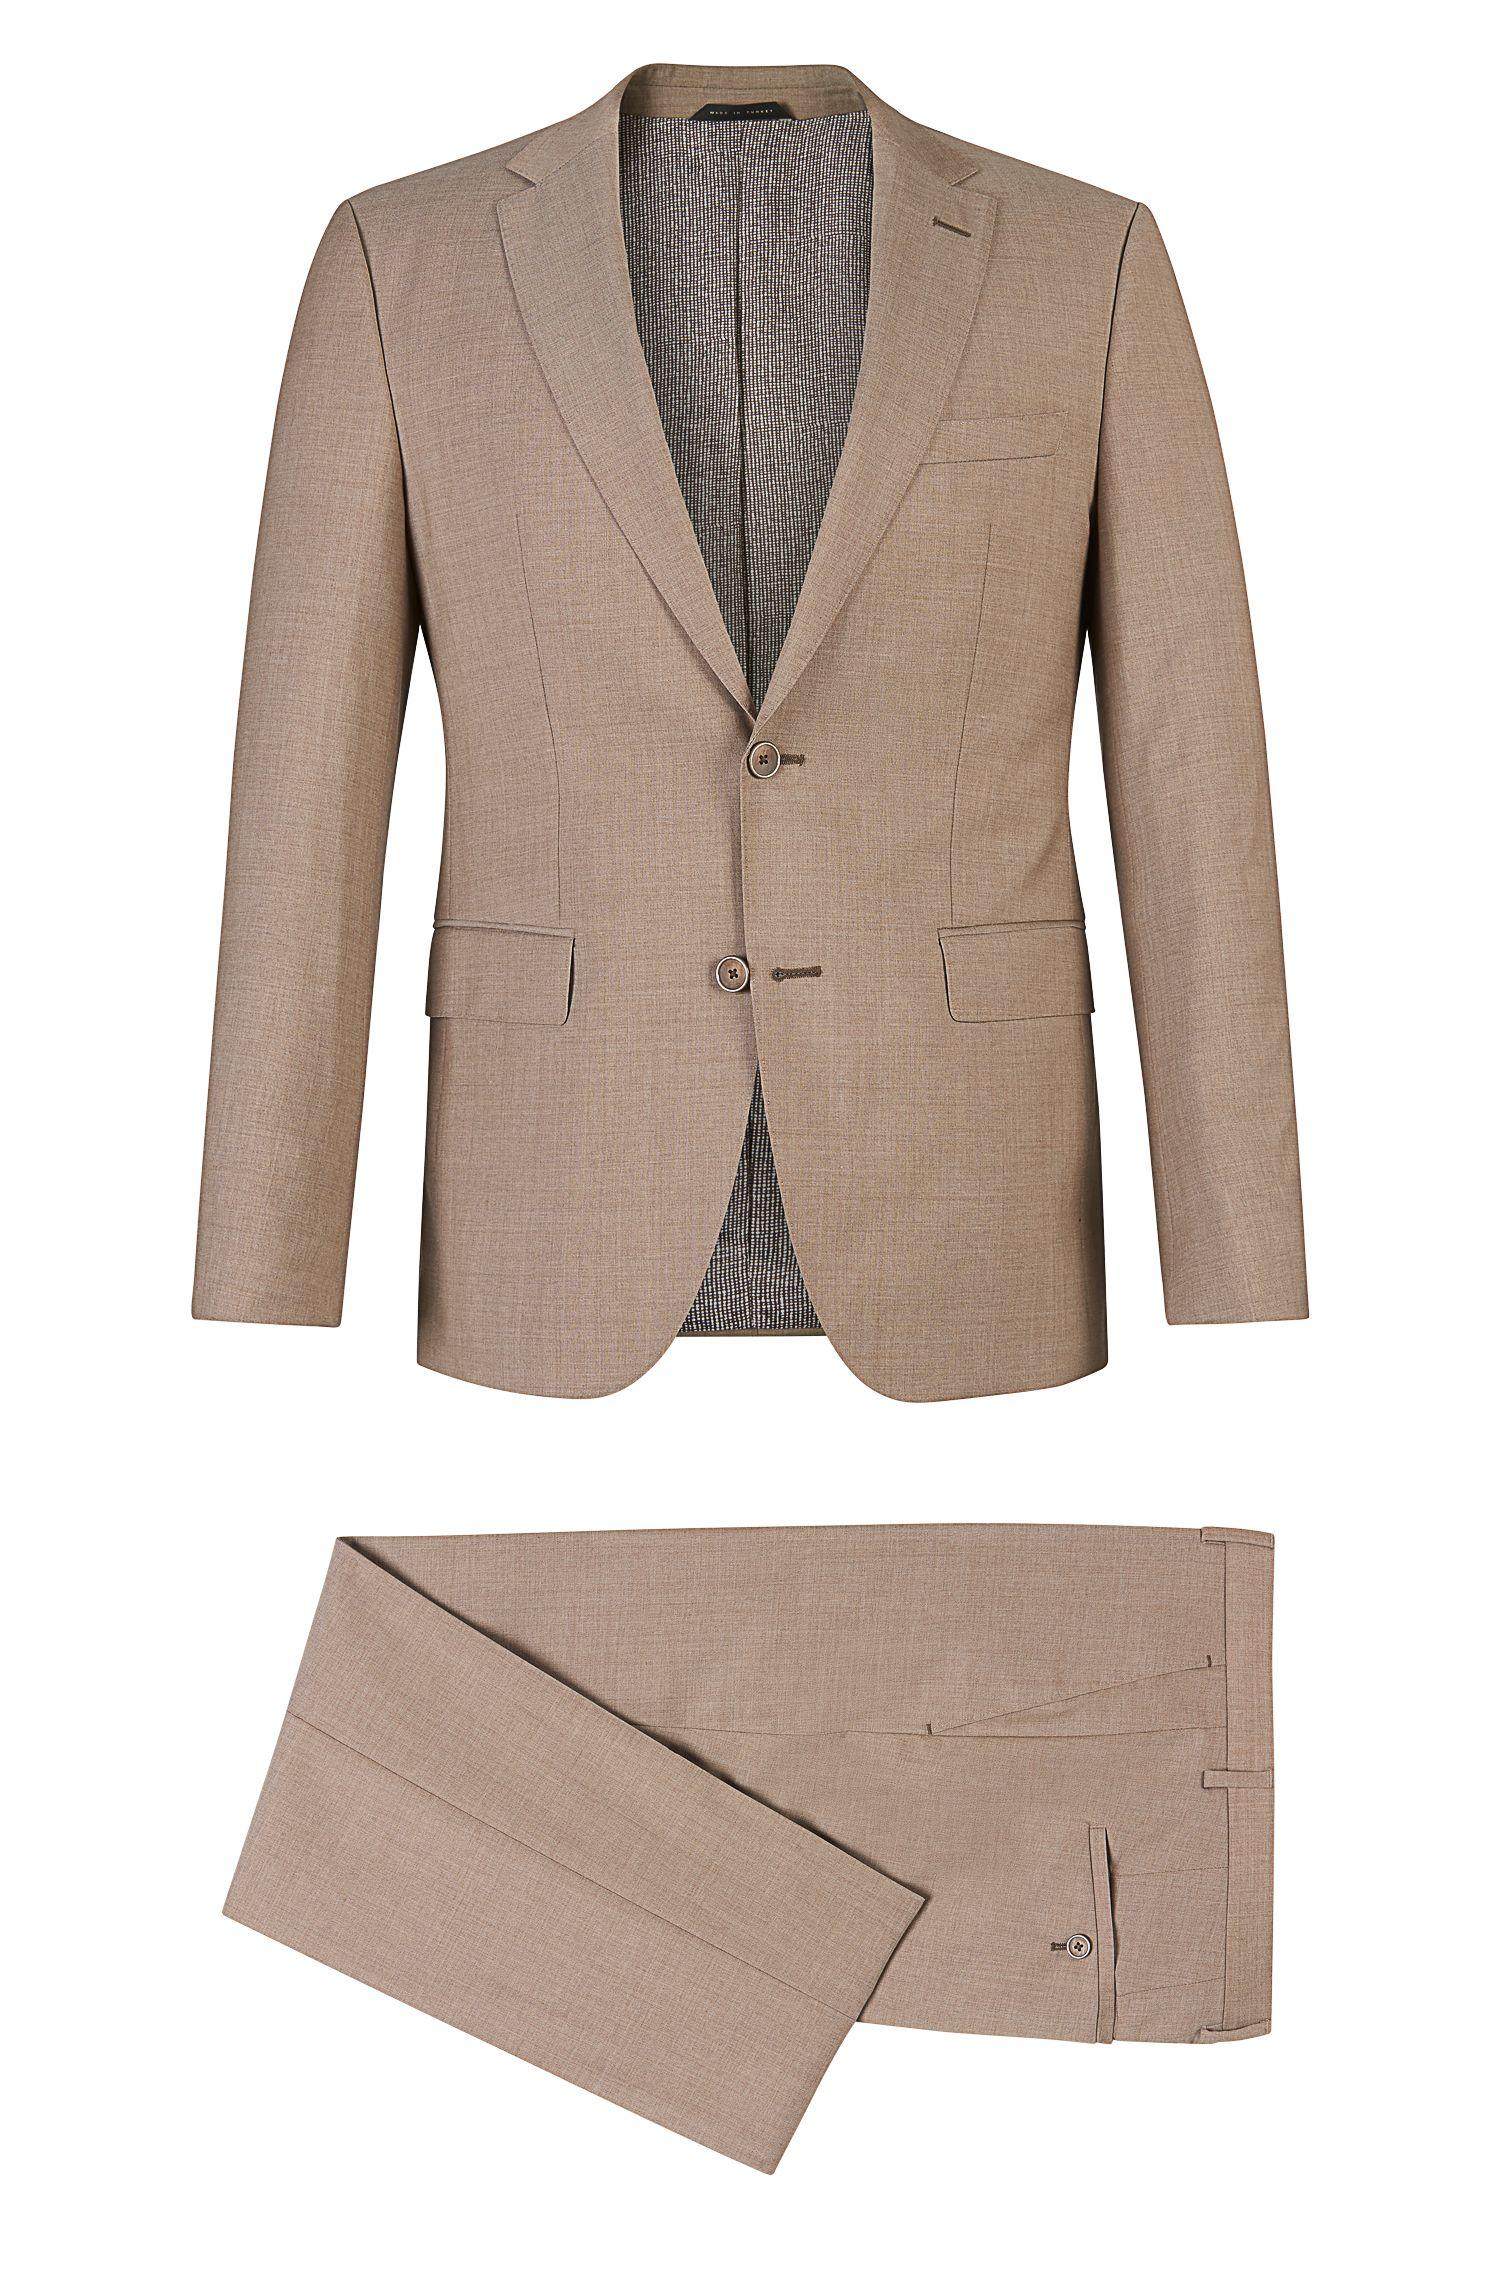 'Jewels/Linus' | Regular Fit, Super 110 Italian Wool Suit